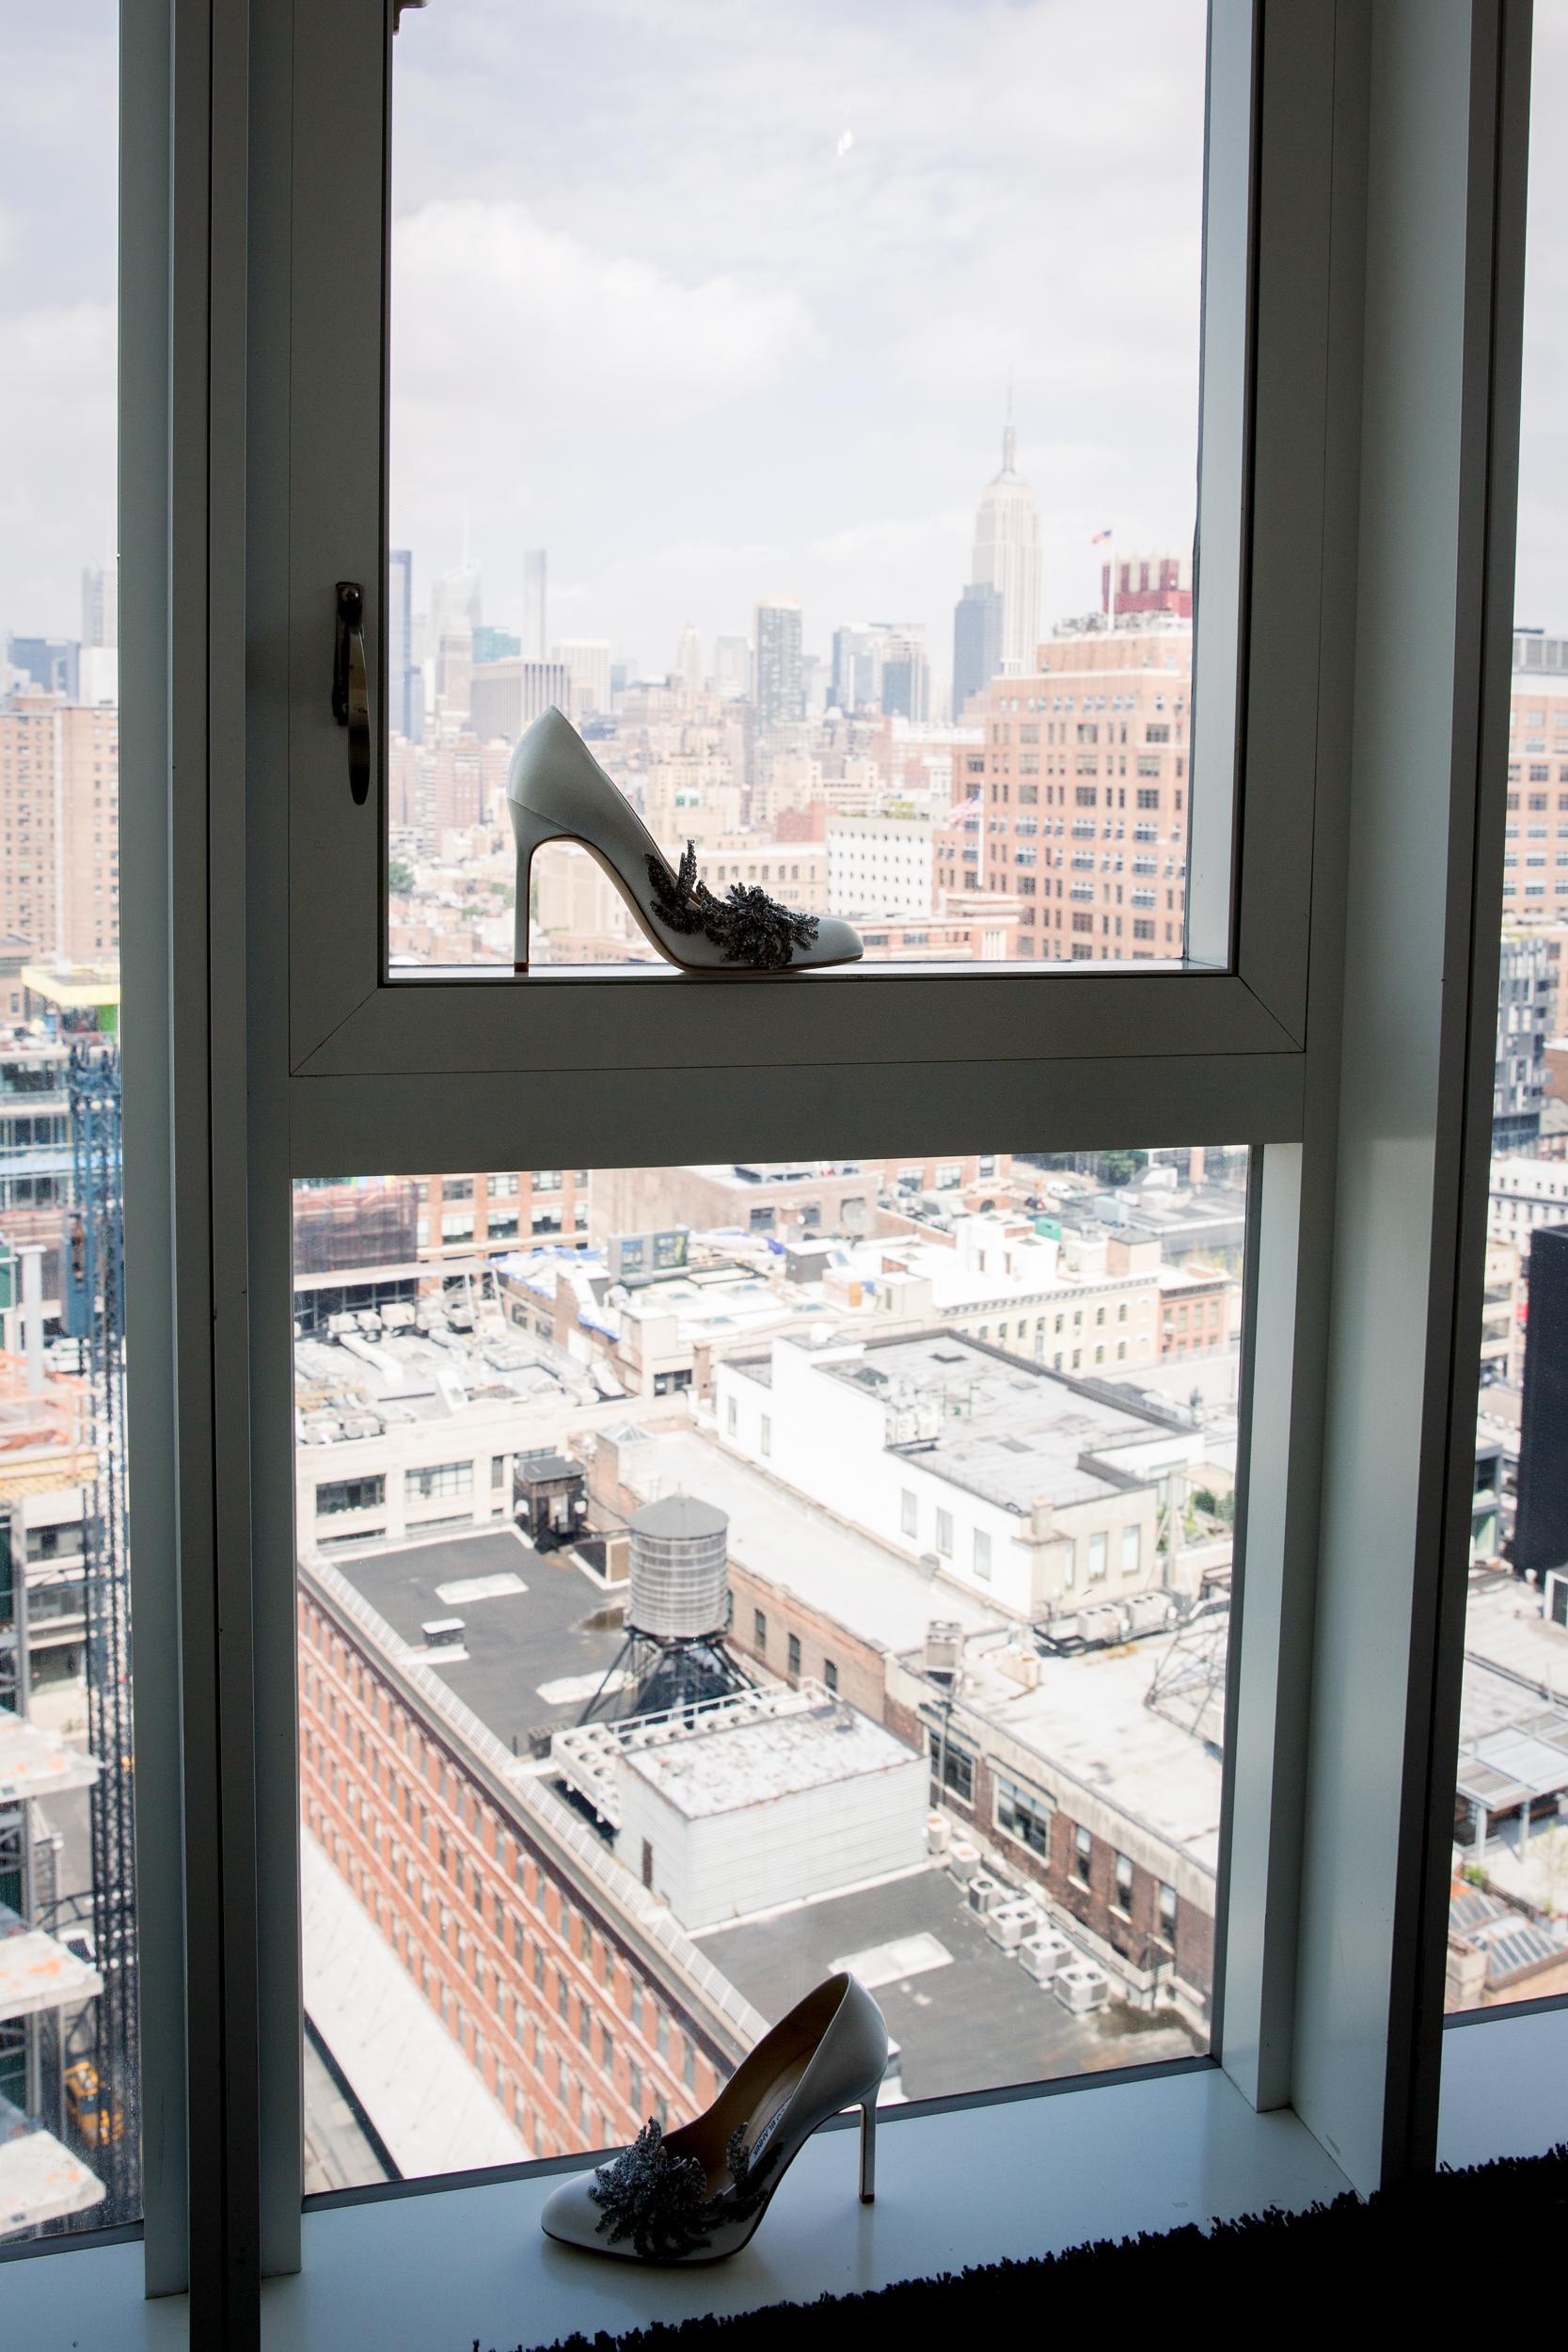 Ceci_New_York_Style_Luxury_Custom_Summer_Wedding_CeciBride_Letterpress_NewYork_Foil_Lighthouse_Chelsea_Piers_3.jpg